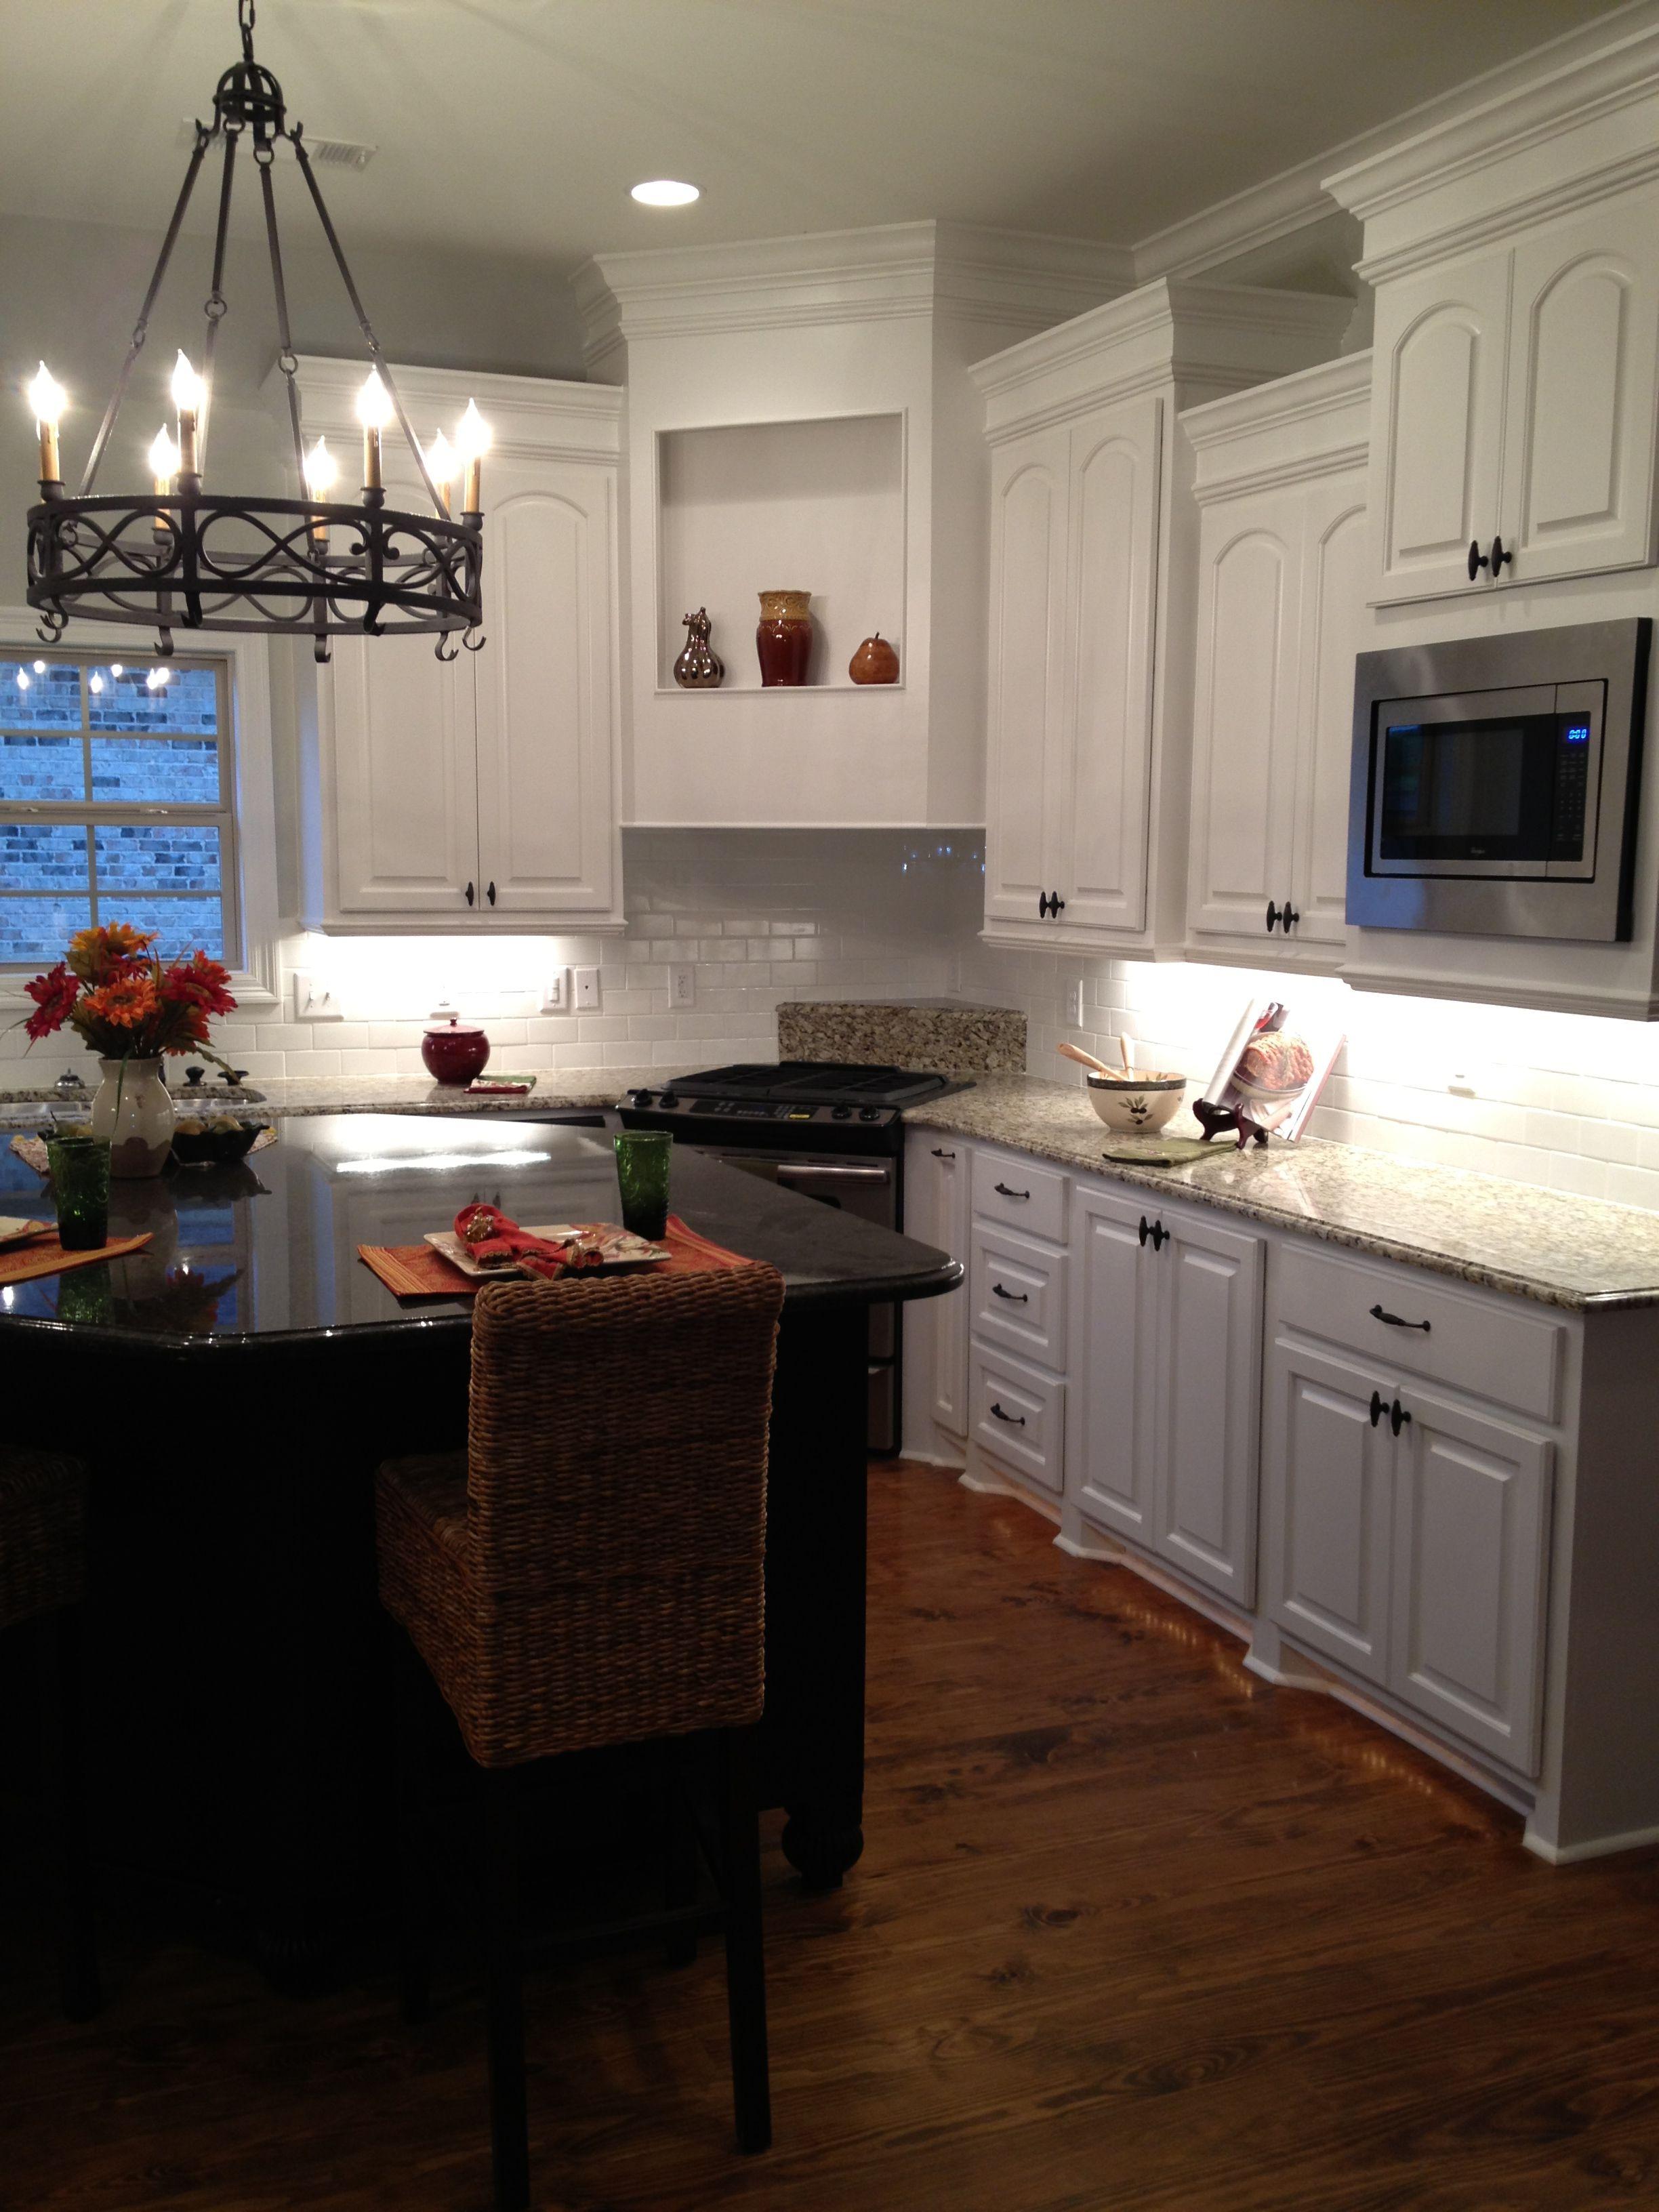 abundant storage elegant fixture large island kitchen kitchen cabinets home decor on kitchen organization elegant id=58939